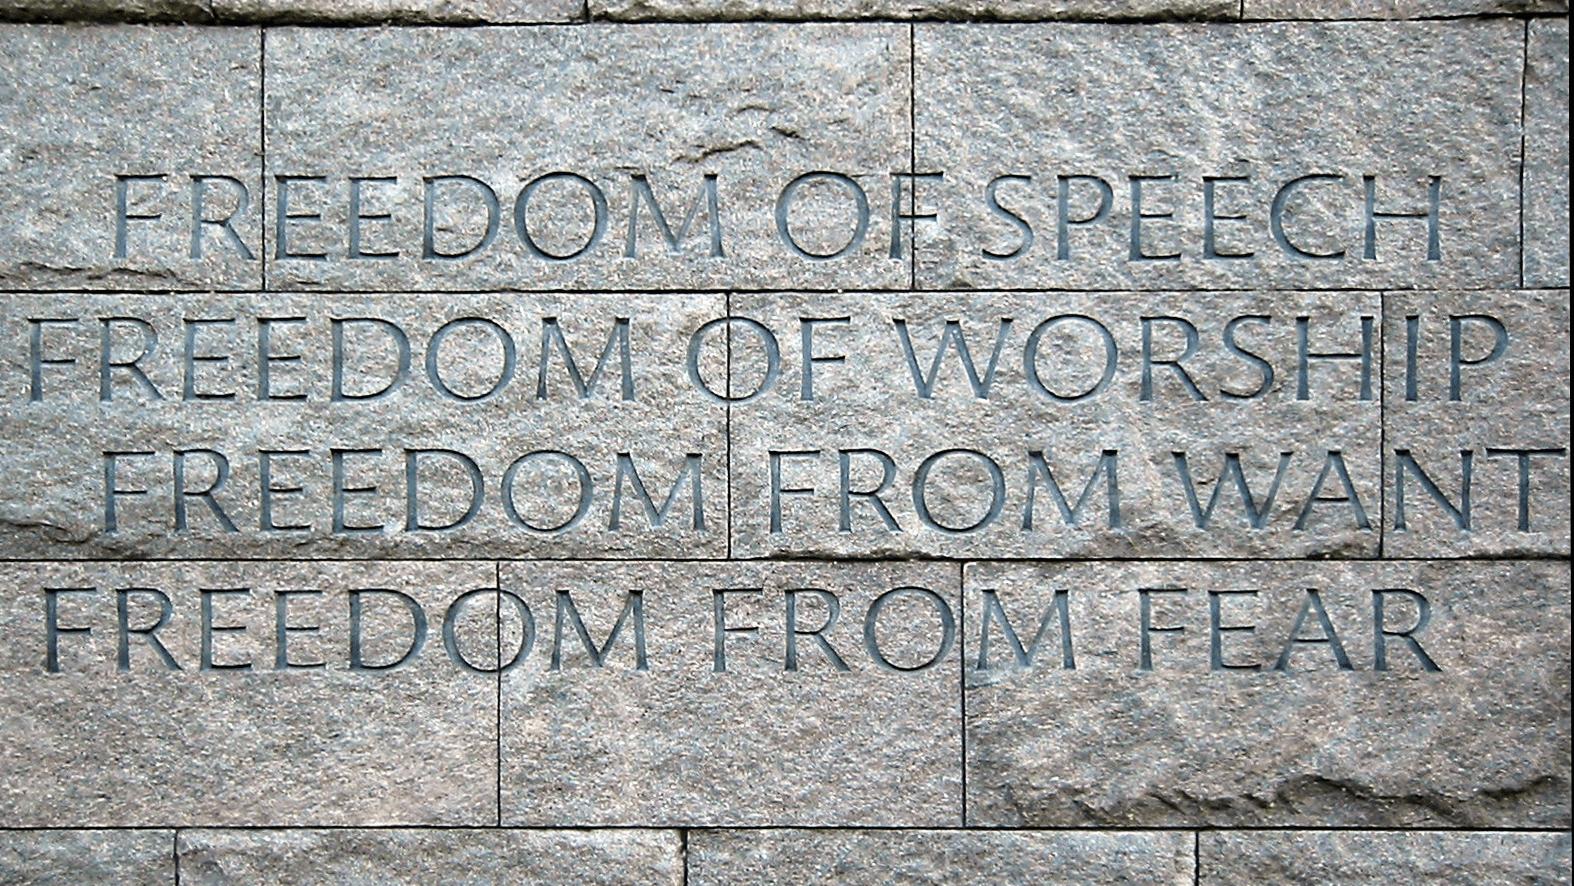 Centering In on Free Speech